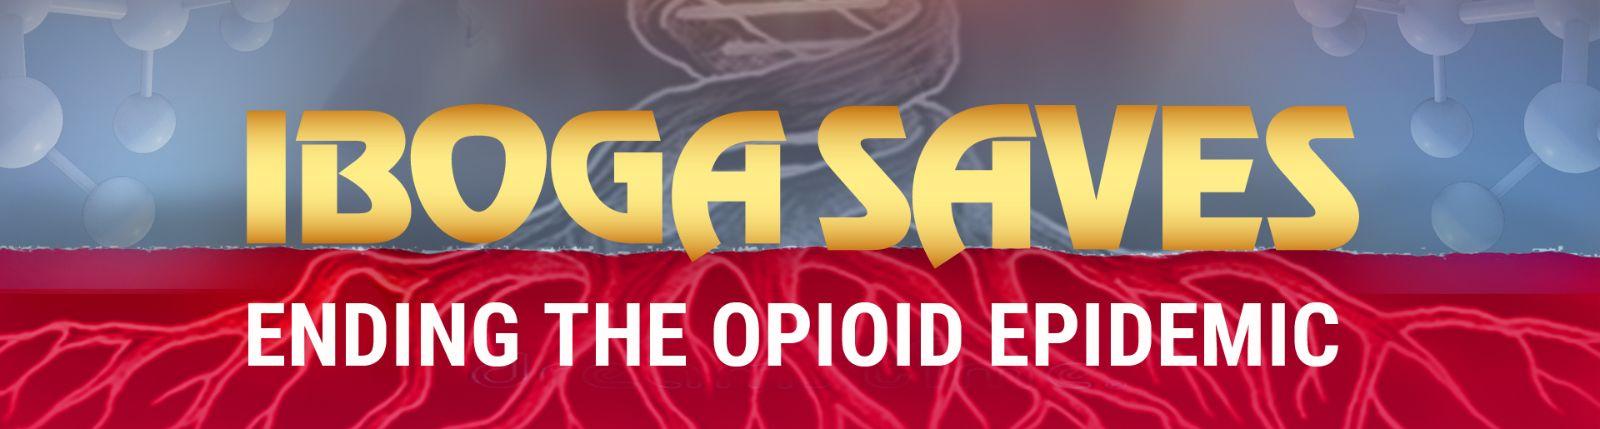 IBOGA SAVES - Ending the Opioid Epidemic